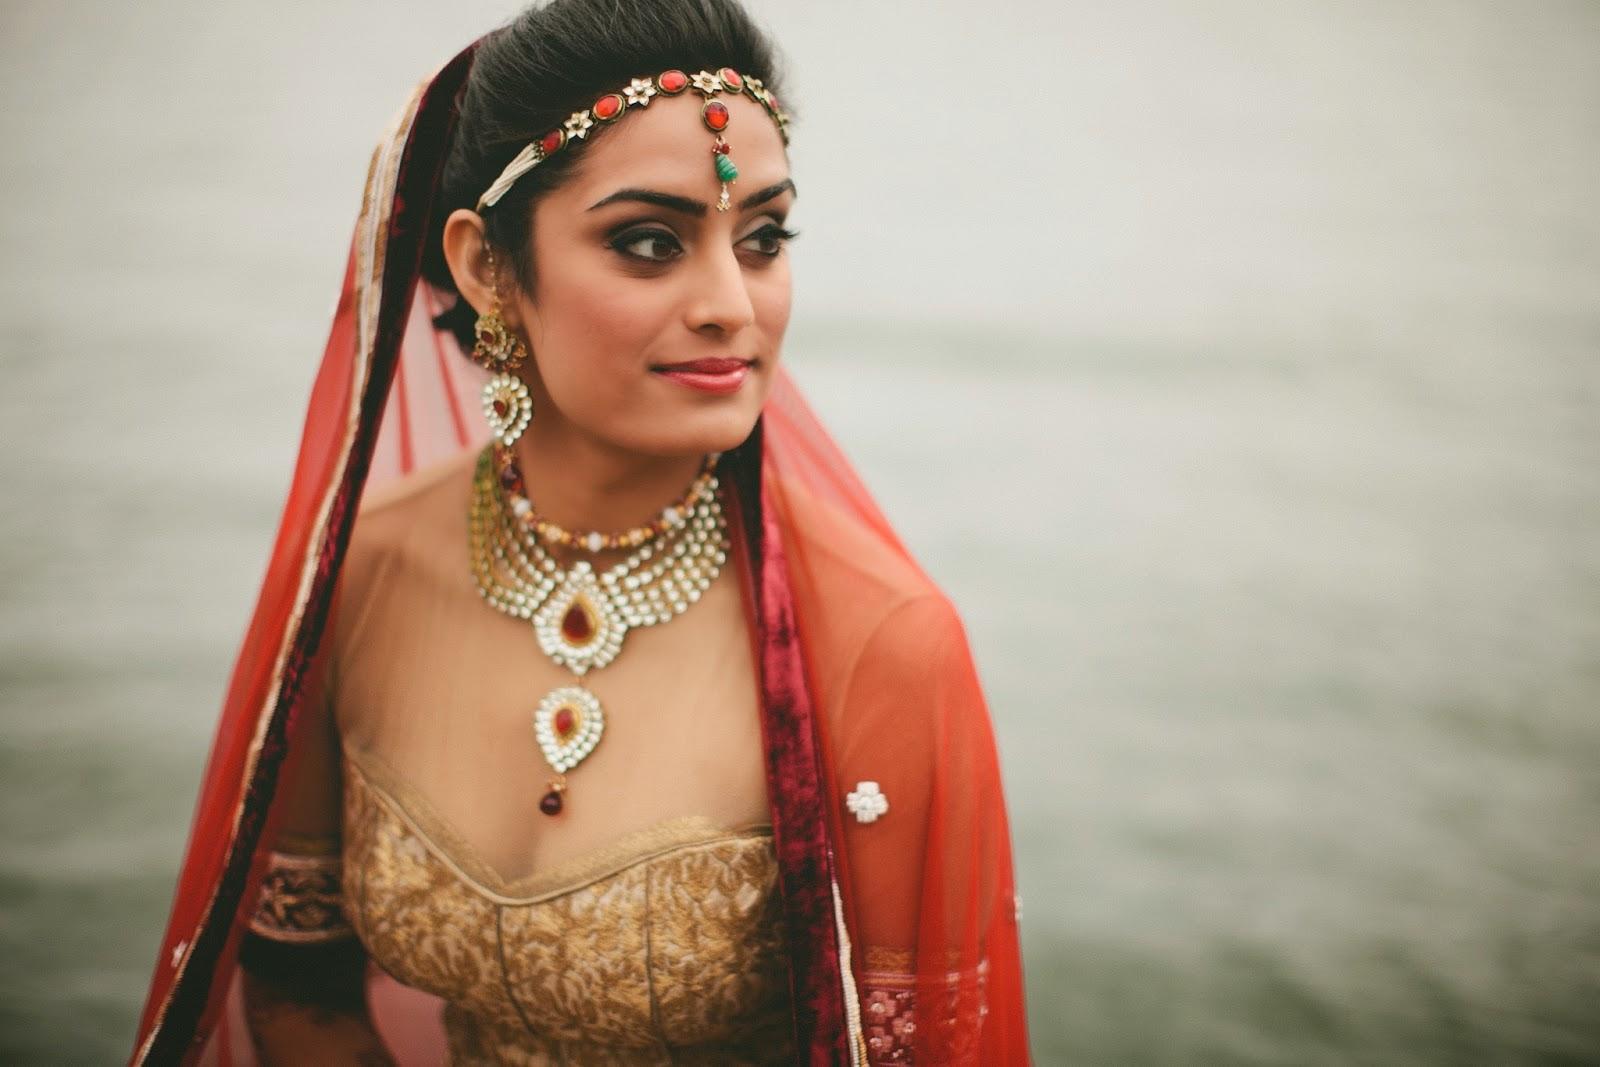 wedding portraits, wedding photography, best shots, indian wedding, south asian wedding